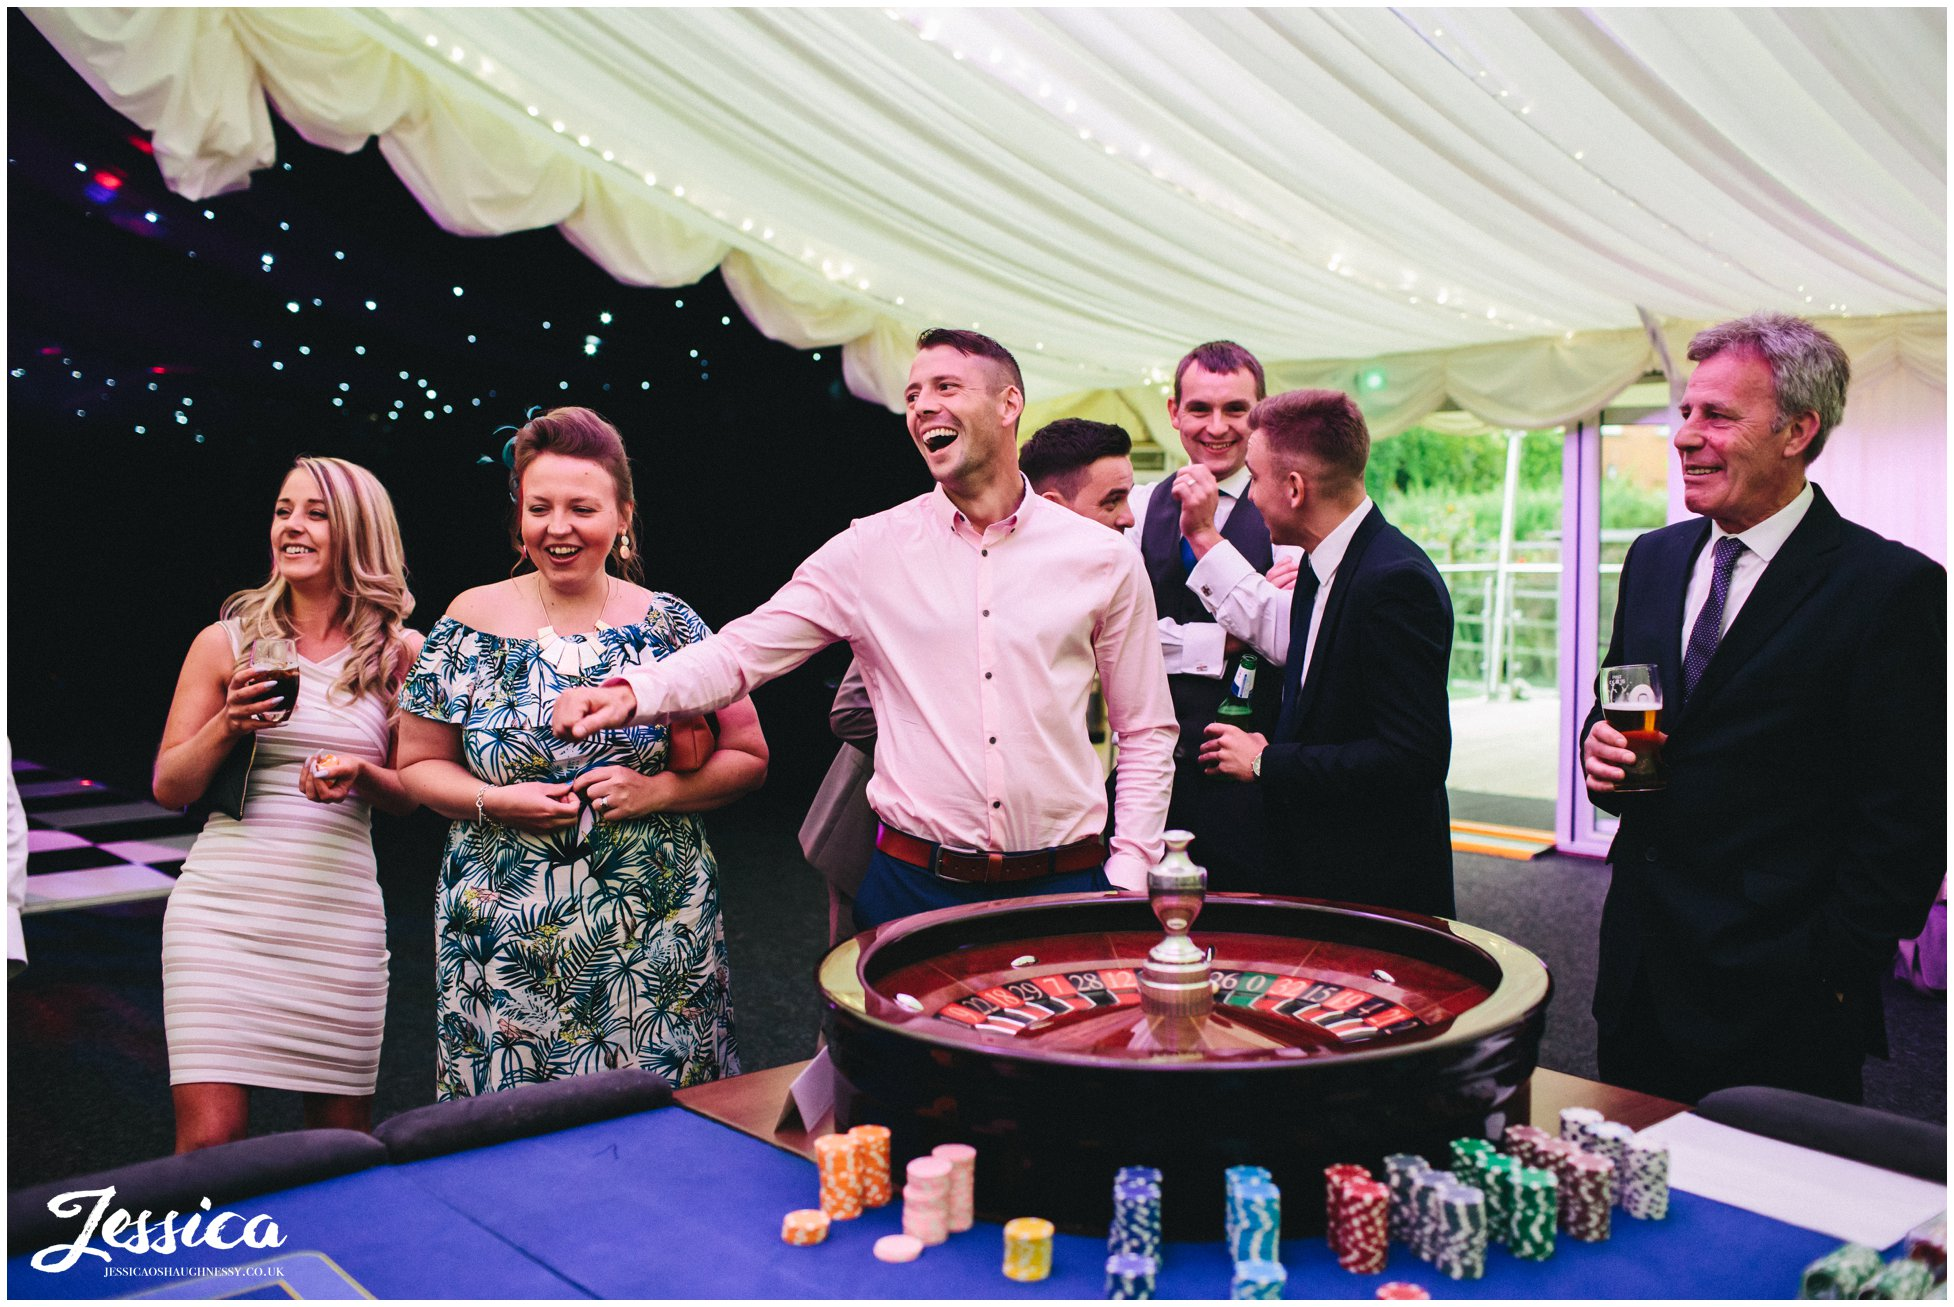 wedding guests enjoying playing on the casino